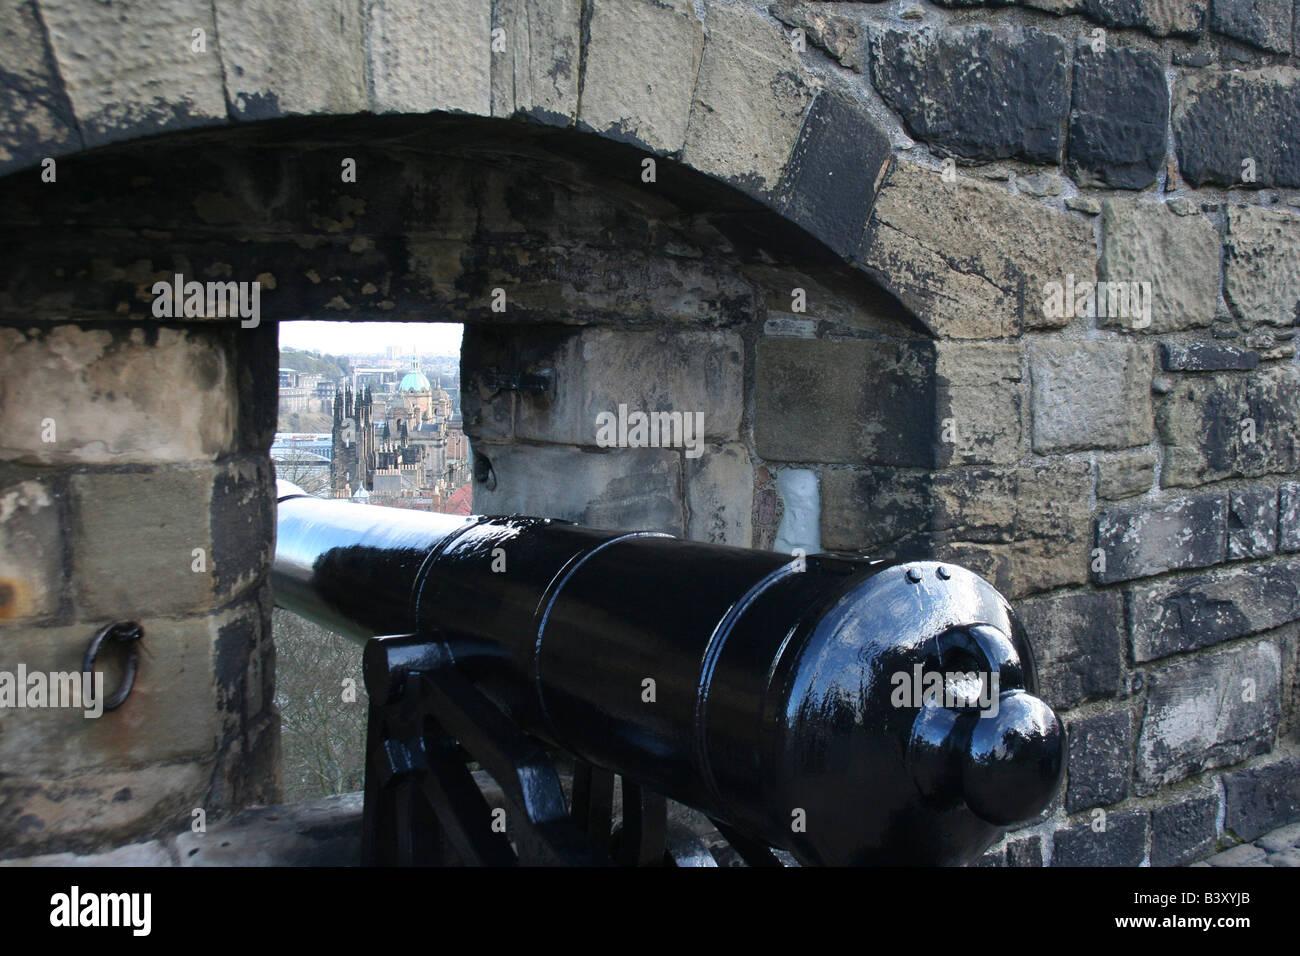 cannon at edinburgh castle - Stock Image